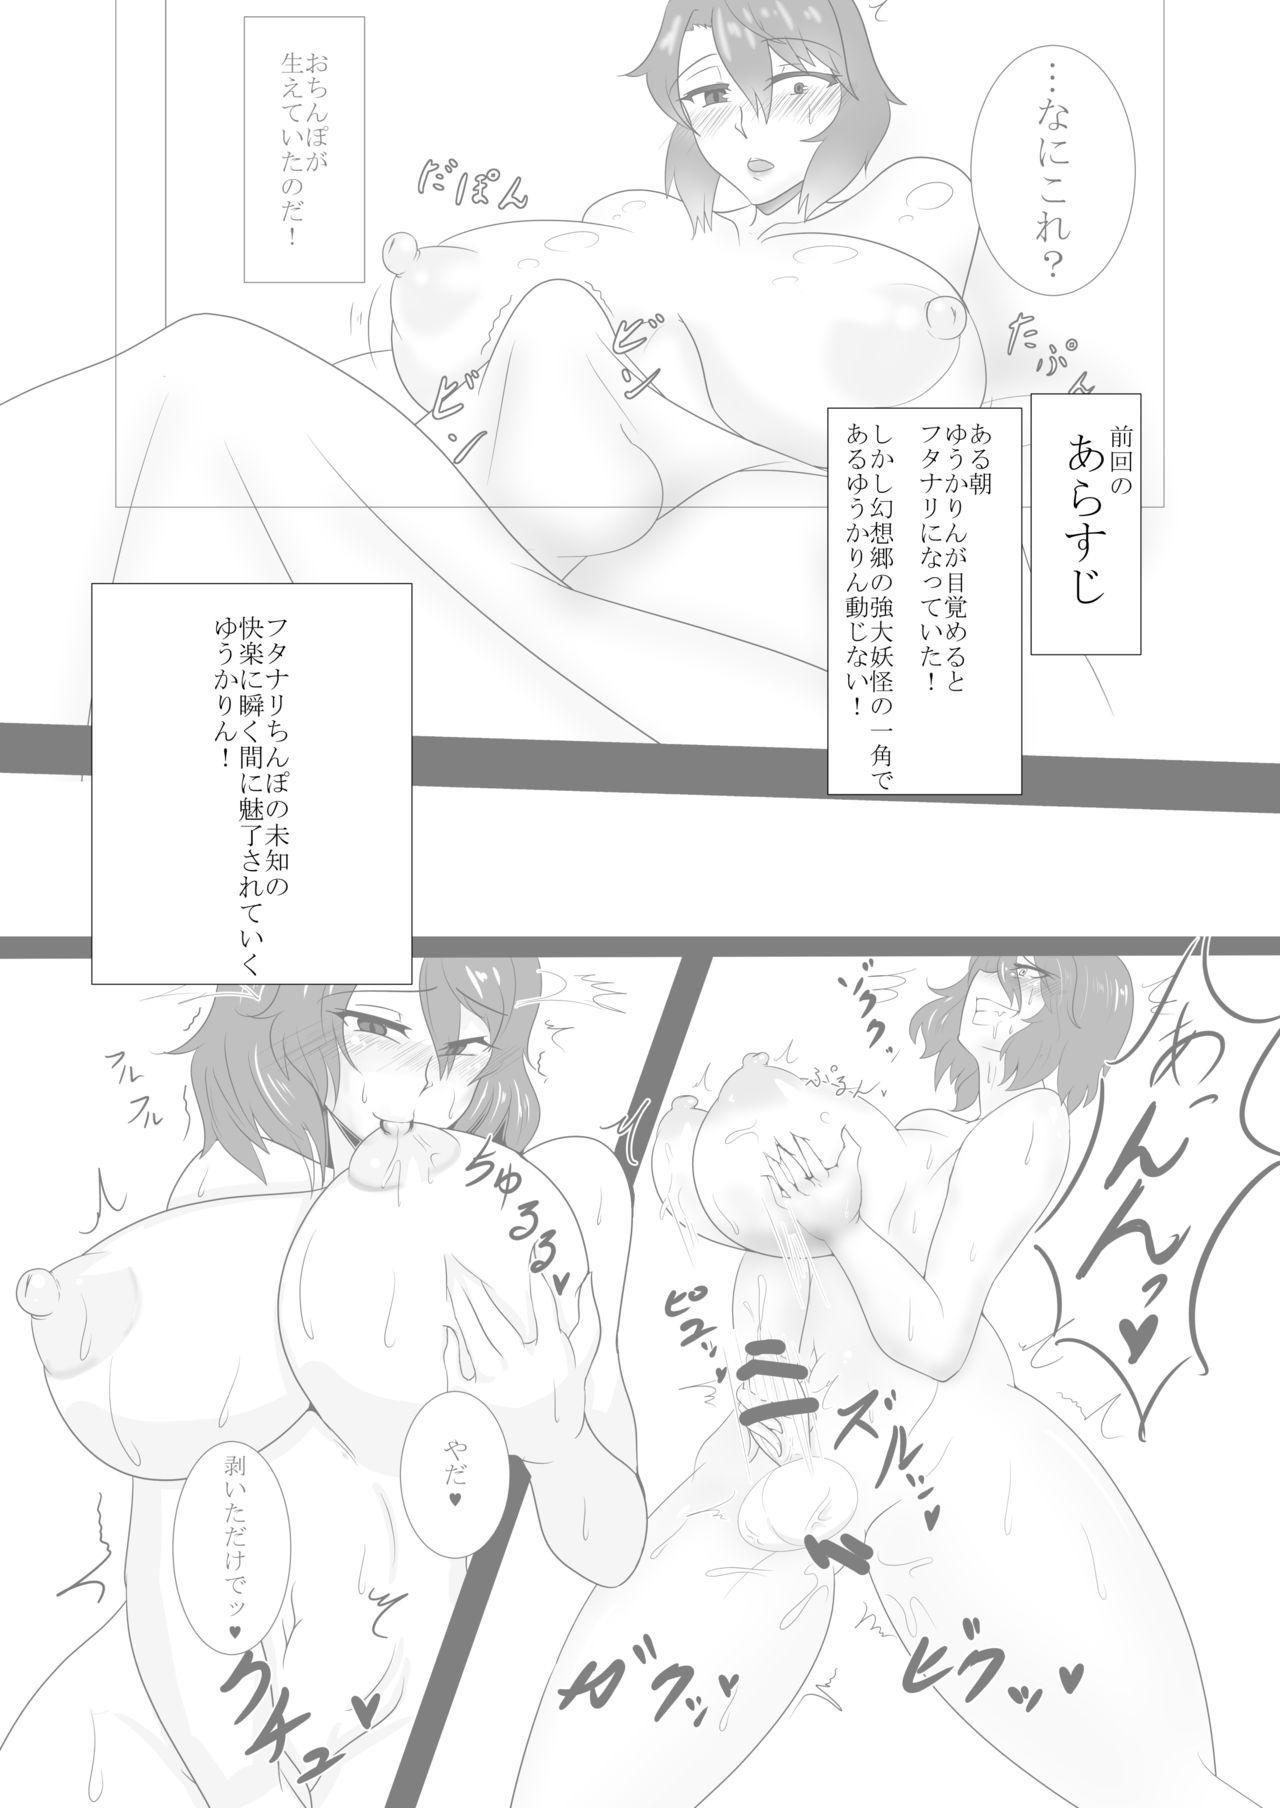 [Black_Sugar(Kari) (Kuroi Megane)] Touhou Futabusa ~Kazami Yuuka~ 2 (Touhou Project) [Digital] 2